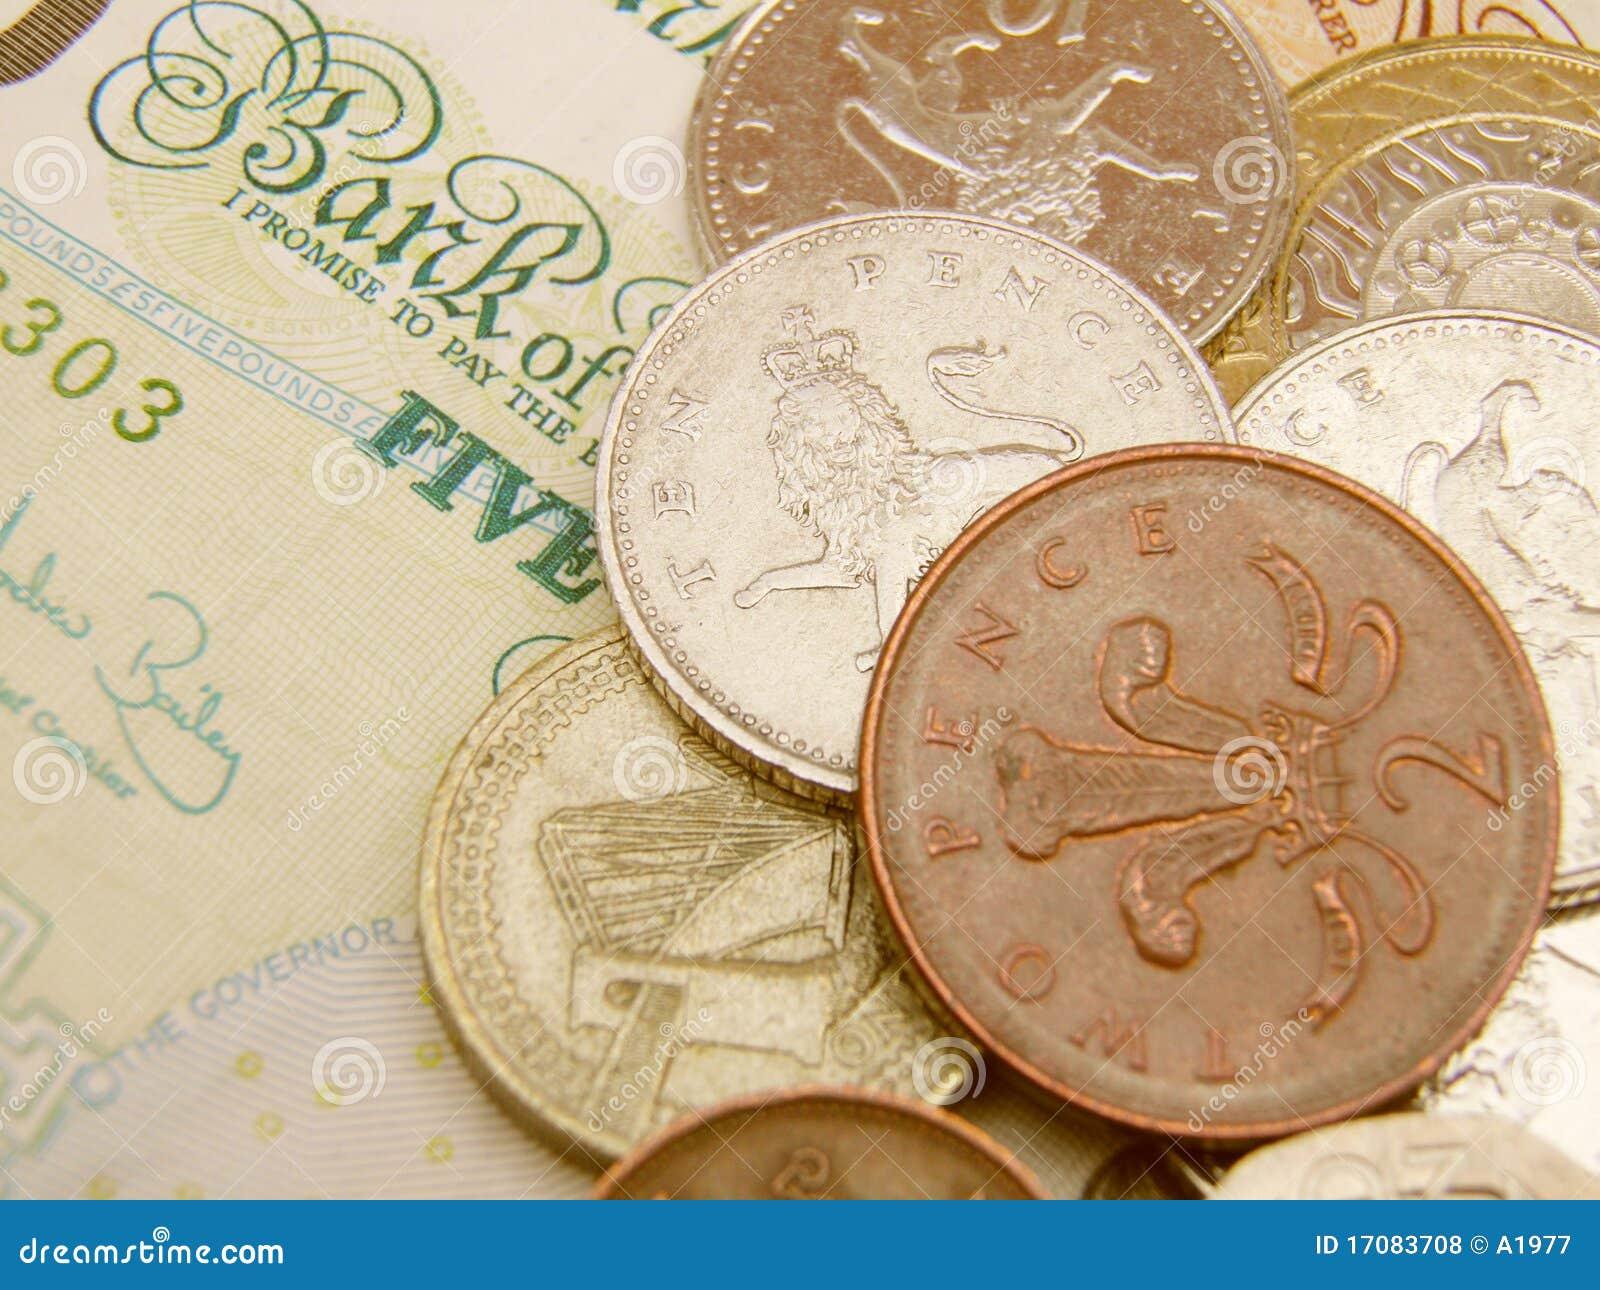 British Pound Sterling Forex Trading 75 Gbp Dollar Usd